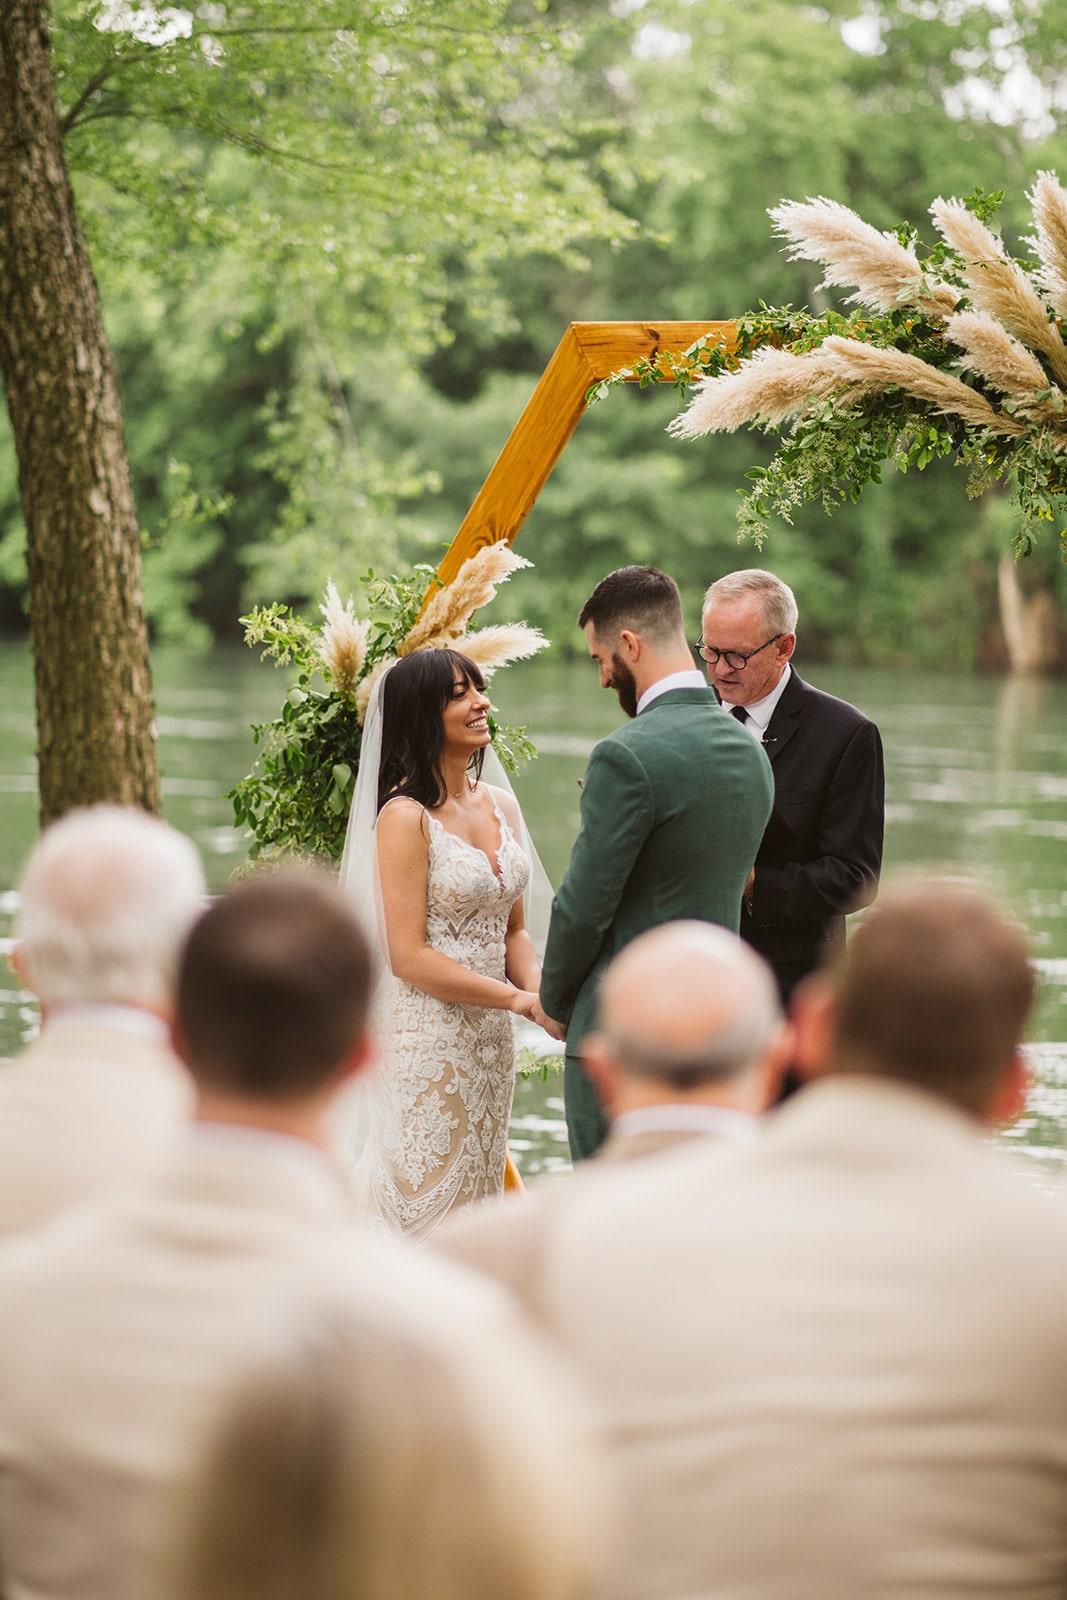 Boho Pampas Grass Wedding, Lang Floral Designs, Chattanooga Wedding Florist and Day-of Coordinator